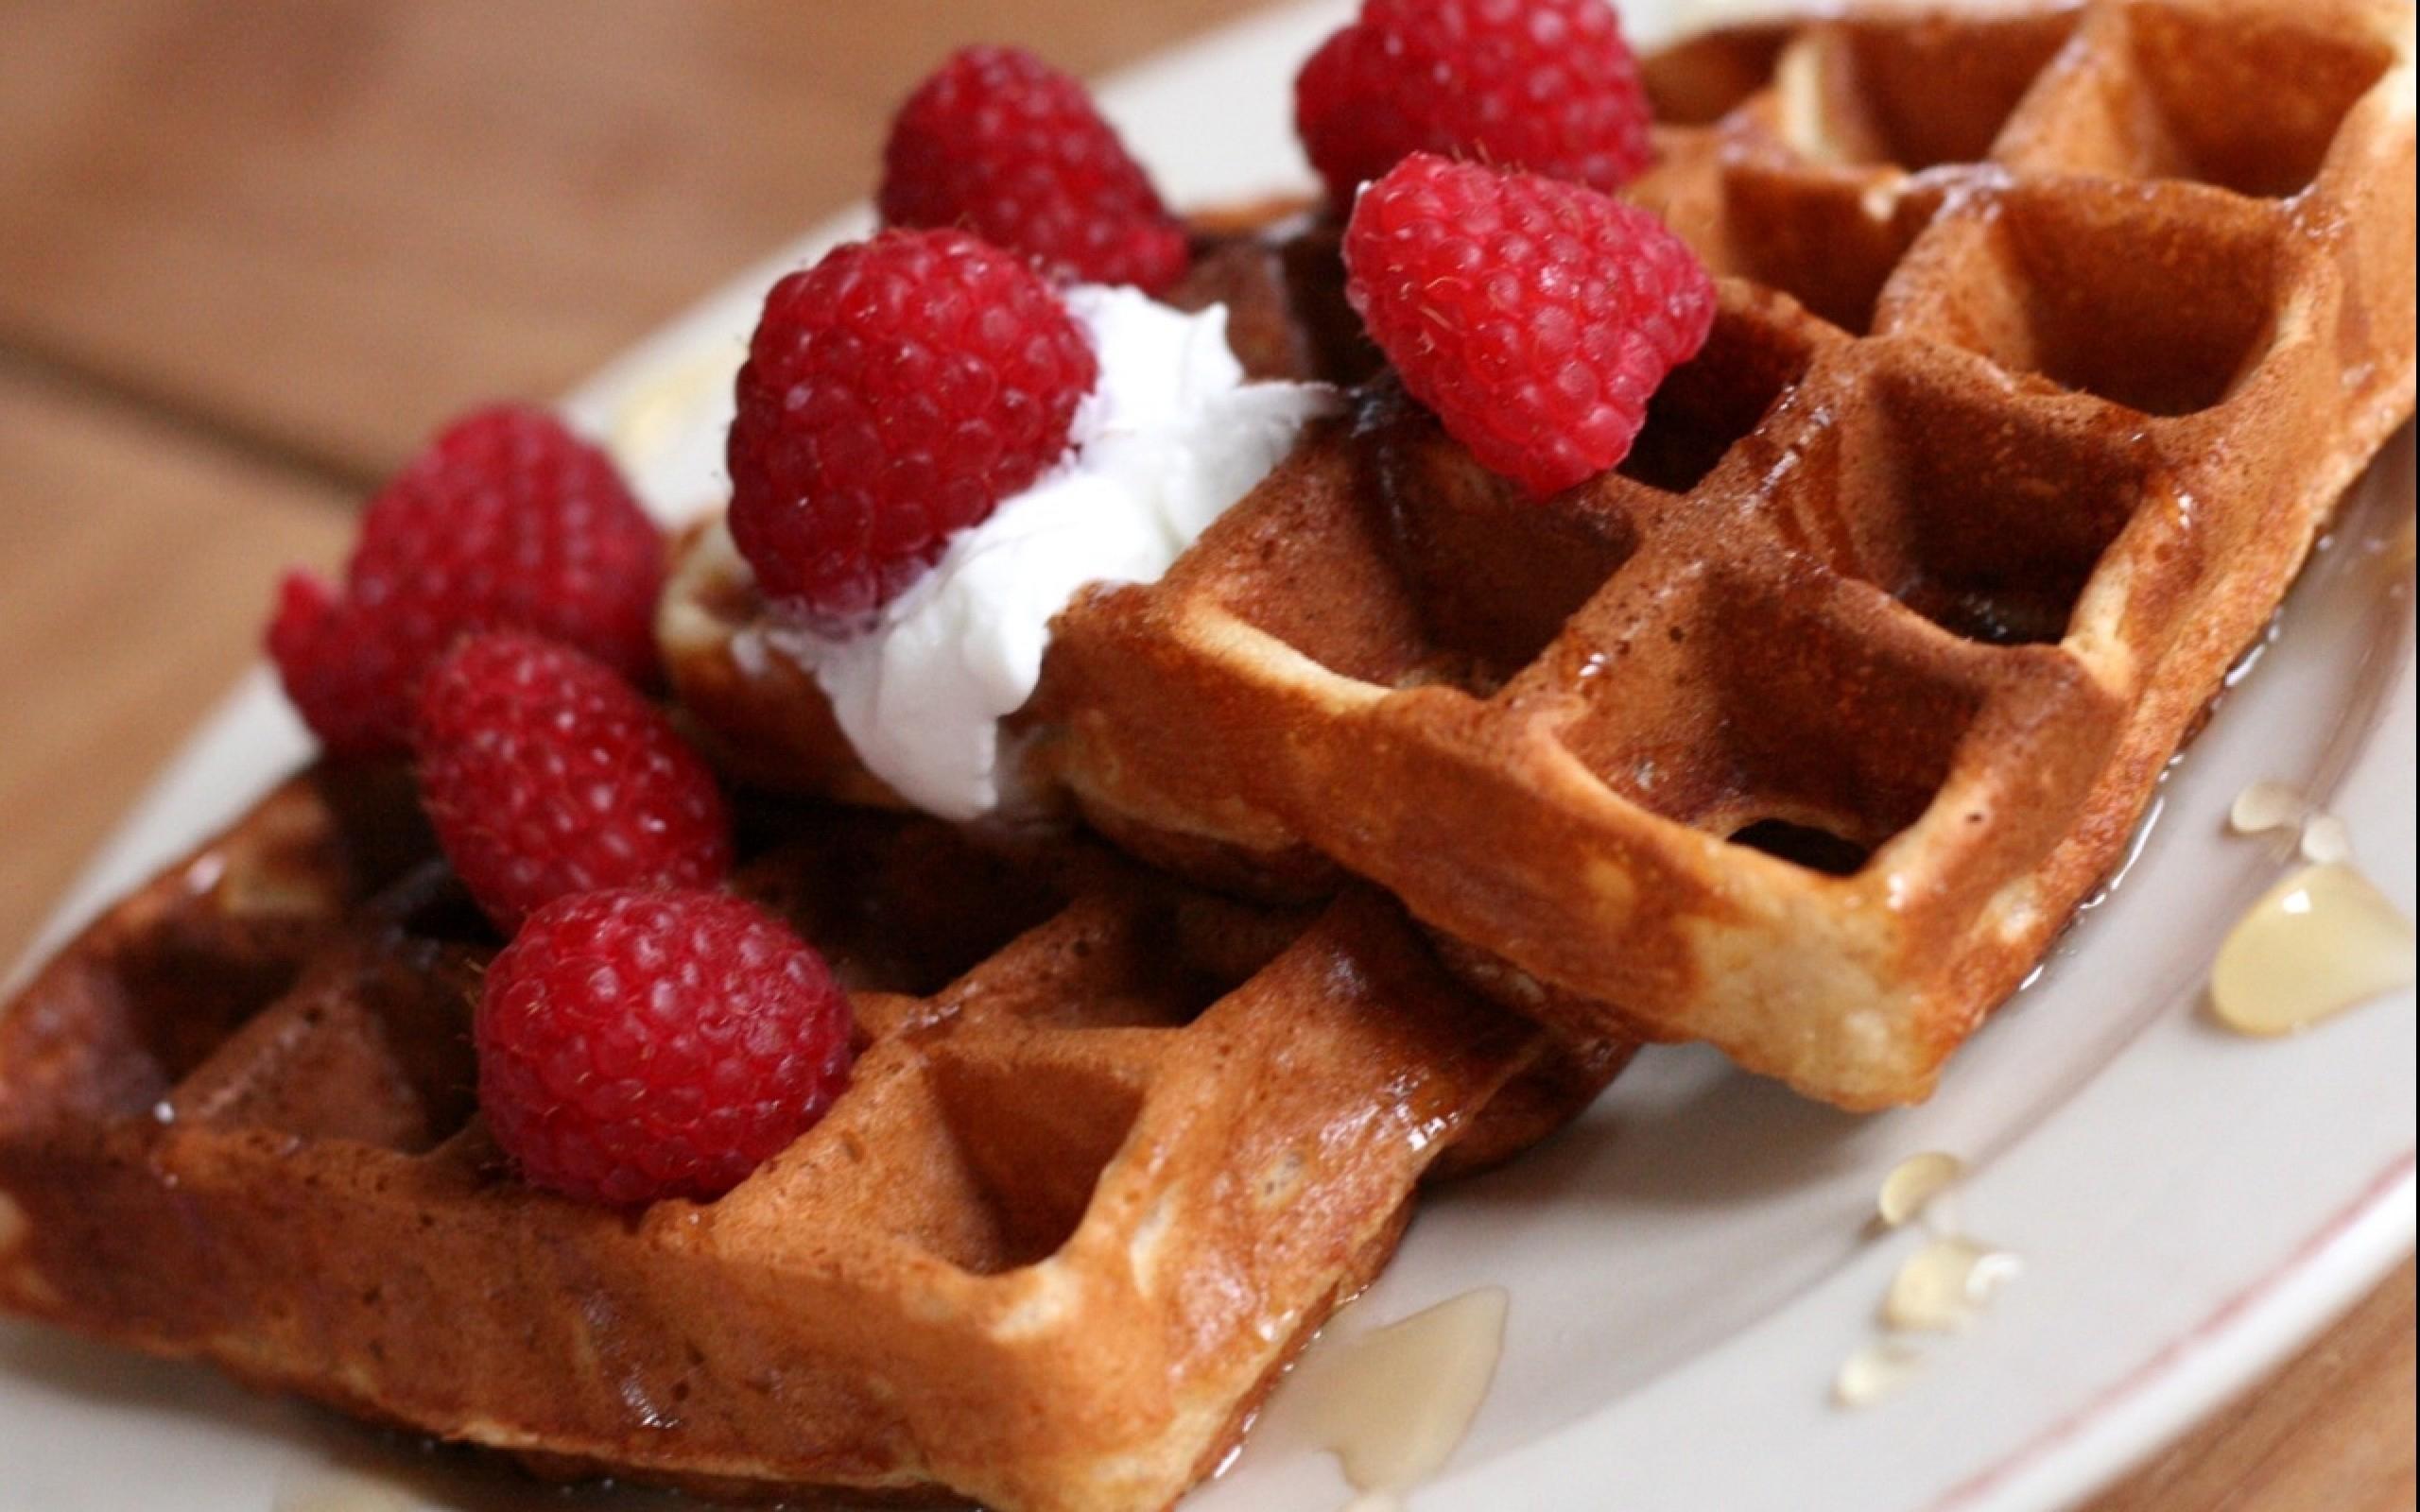 Alimento - Waffle  Sfondo